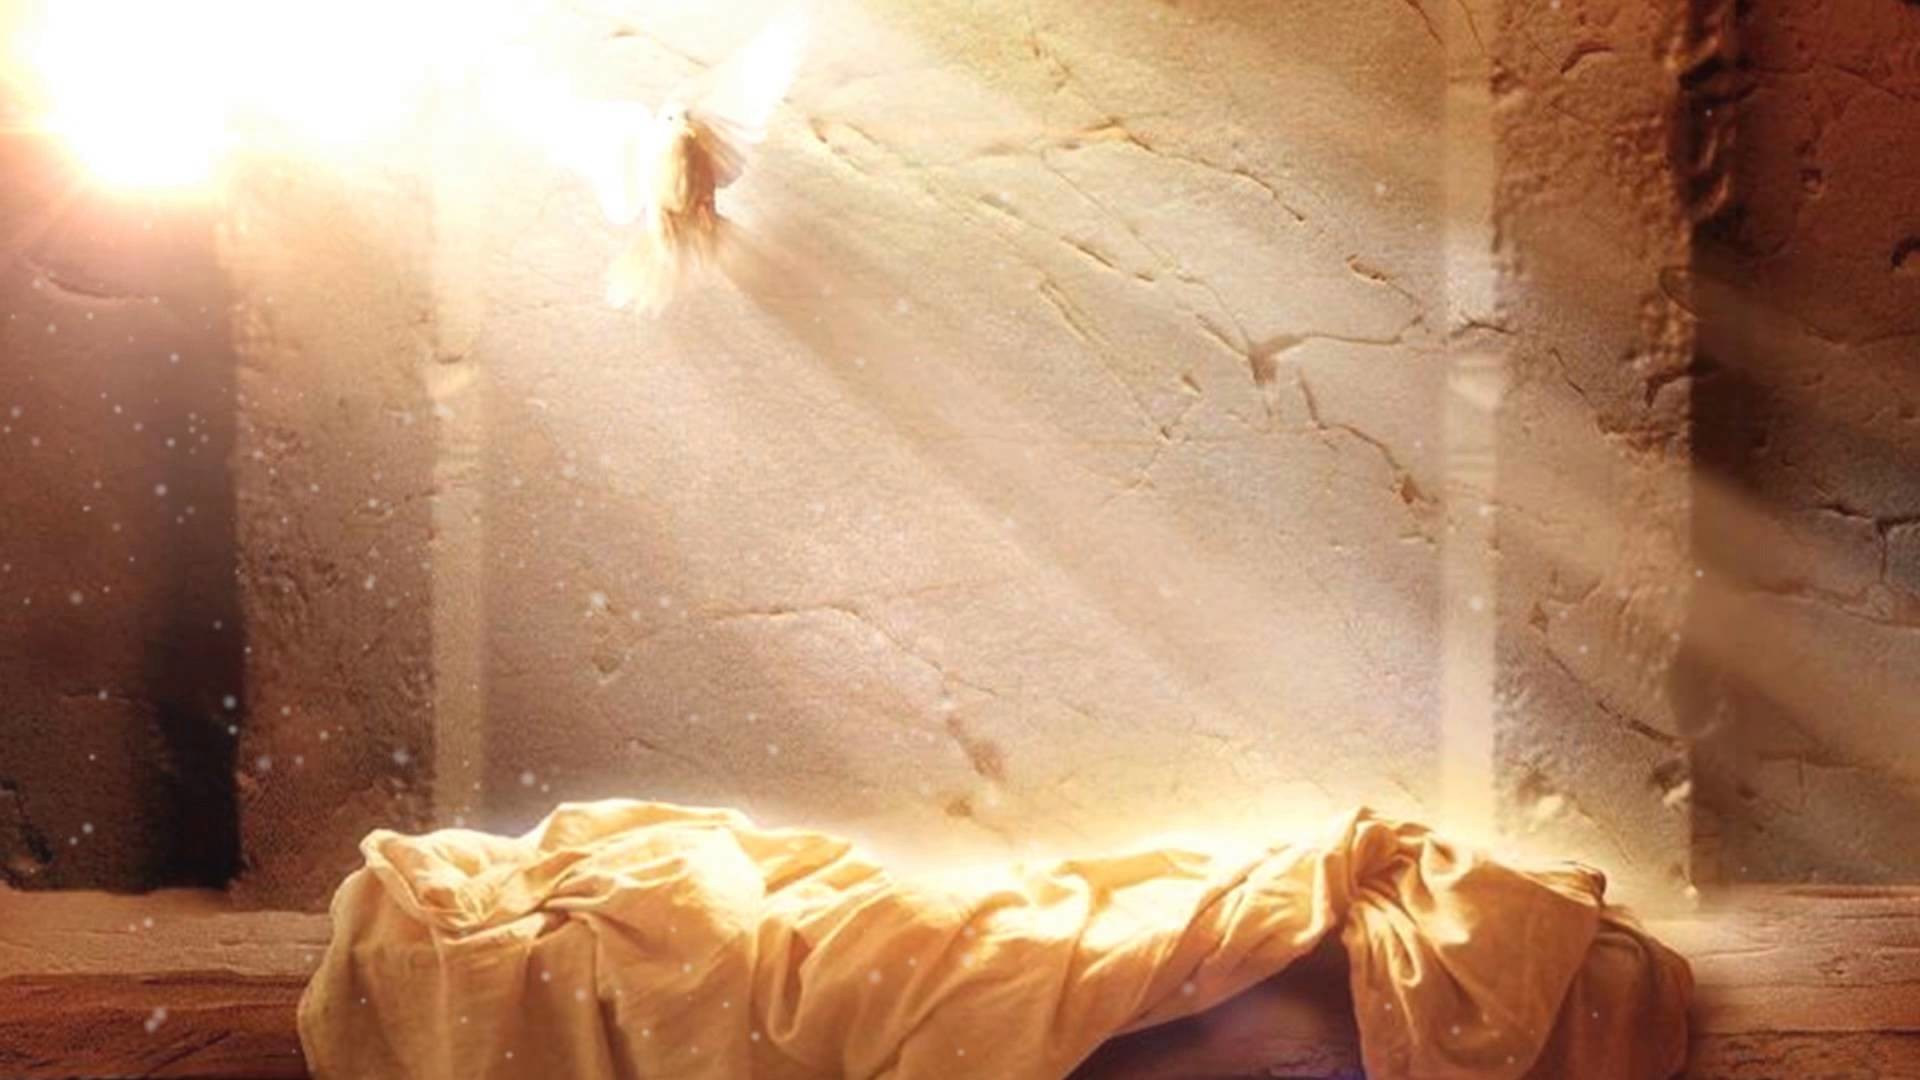 happy easter jesus resurrection risen hd wallpaper background